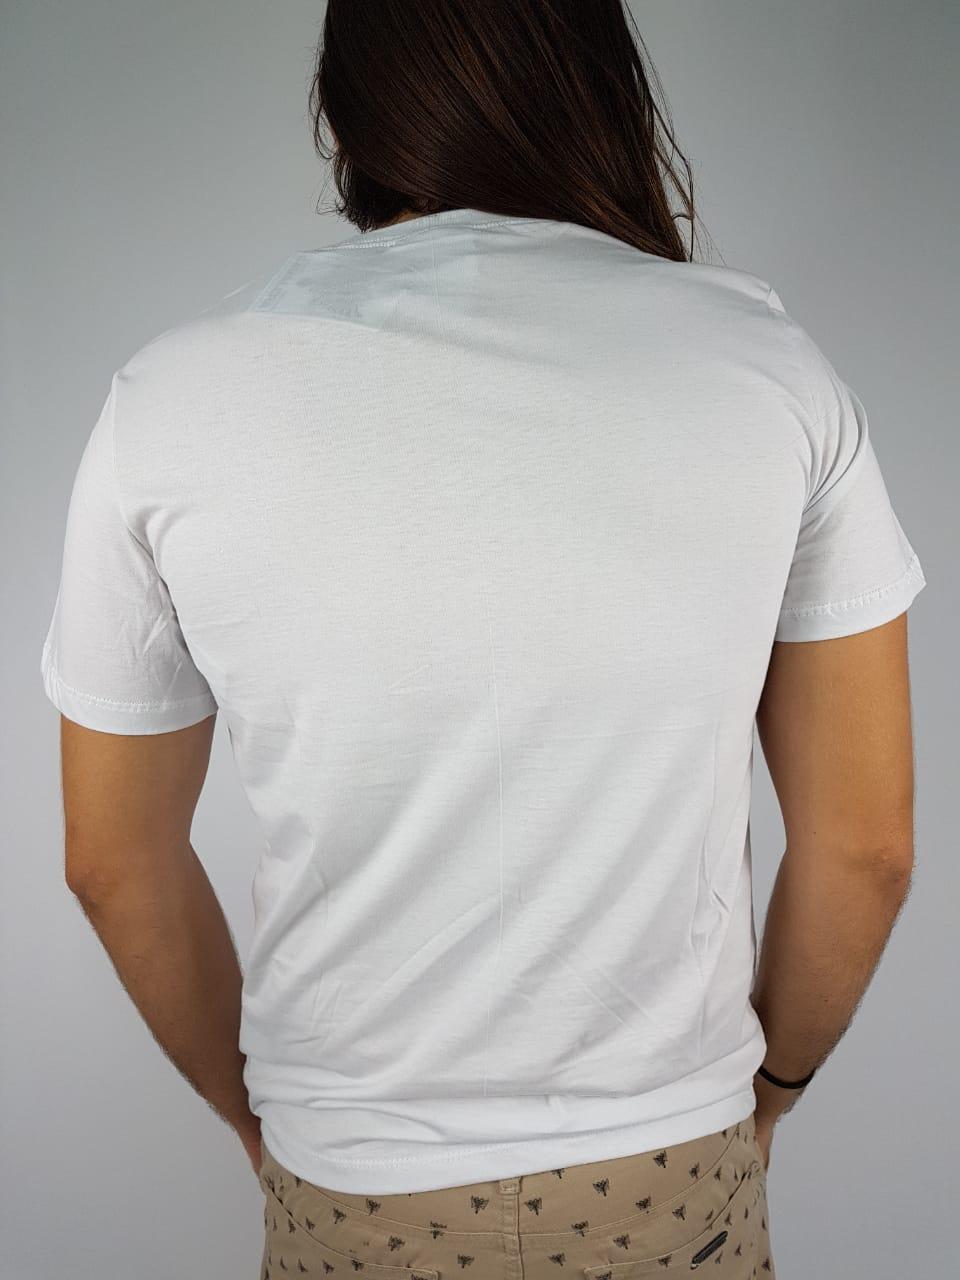 Camiseta Cavalera Masculina Manga Curta He Man   - Pick Tita